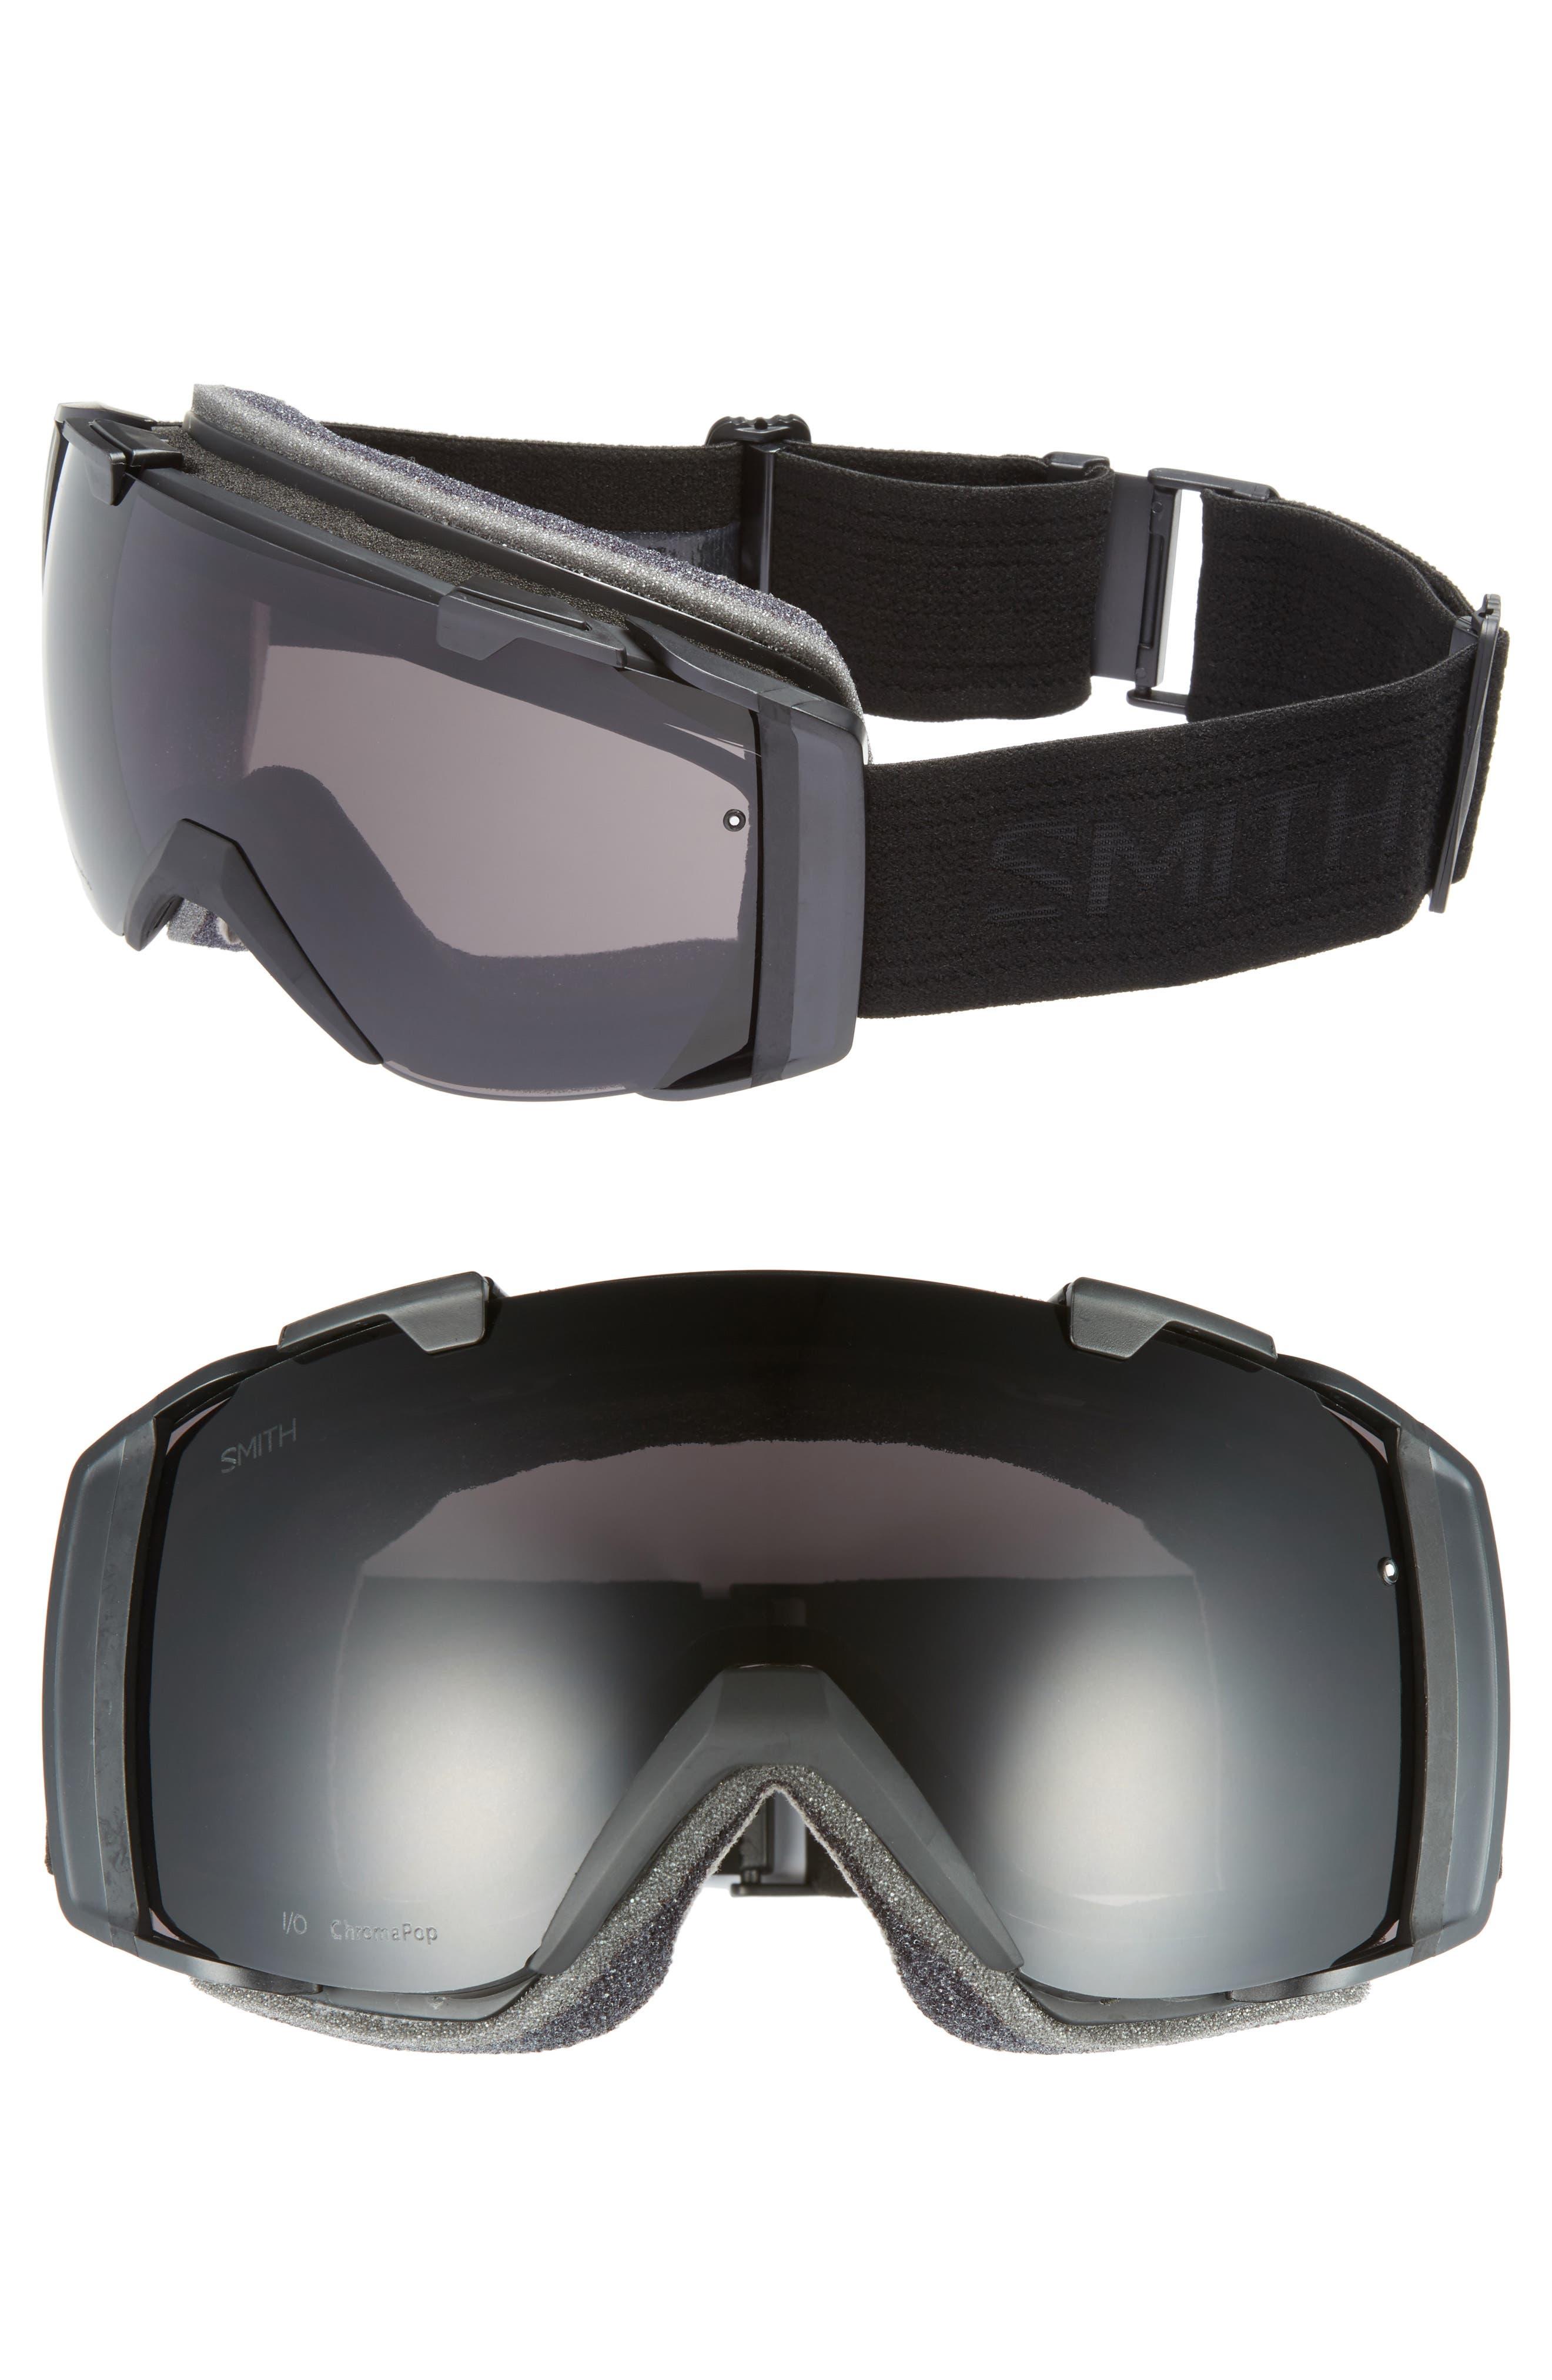 I/O 180mm Snow/Ski Goggles,                         Main,                         color, Blackout/ Mirror